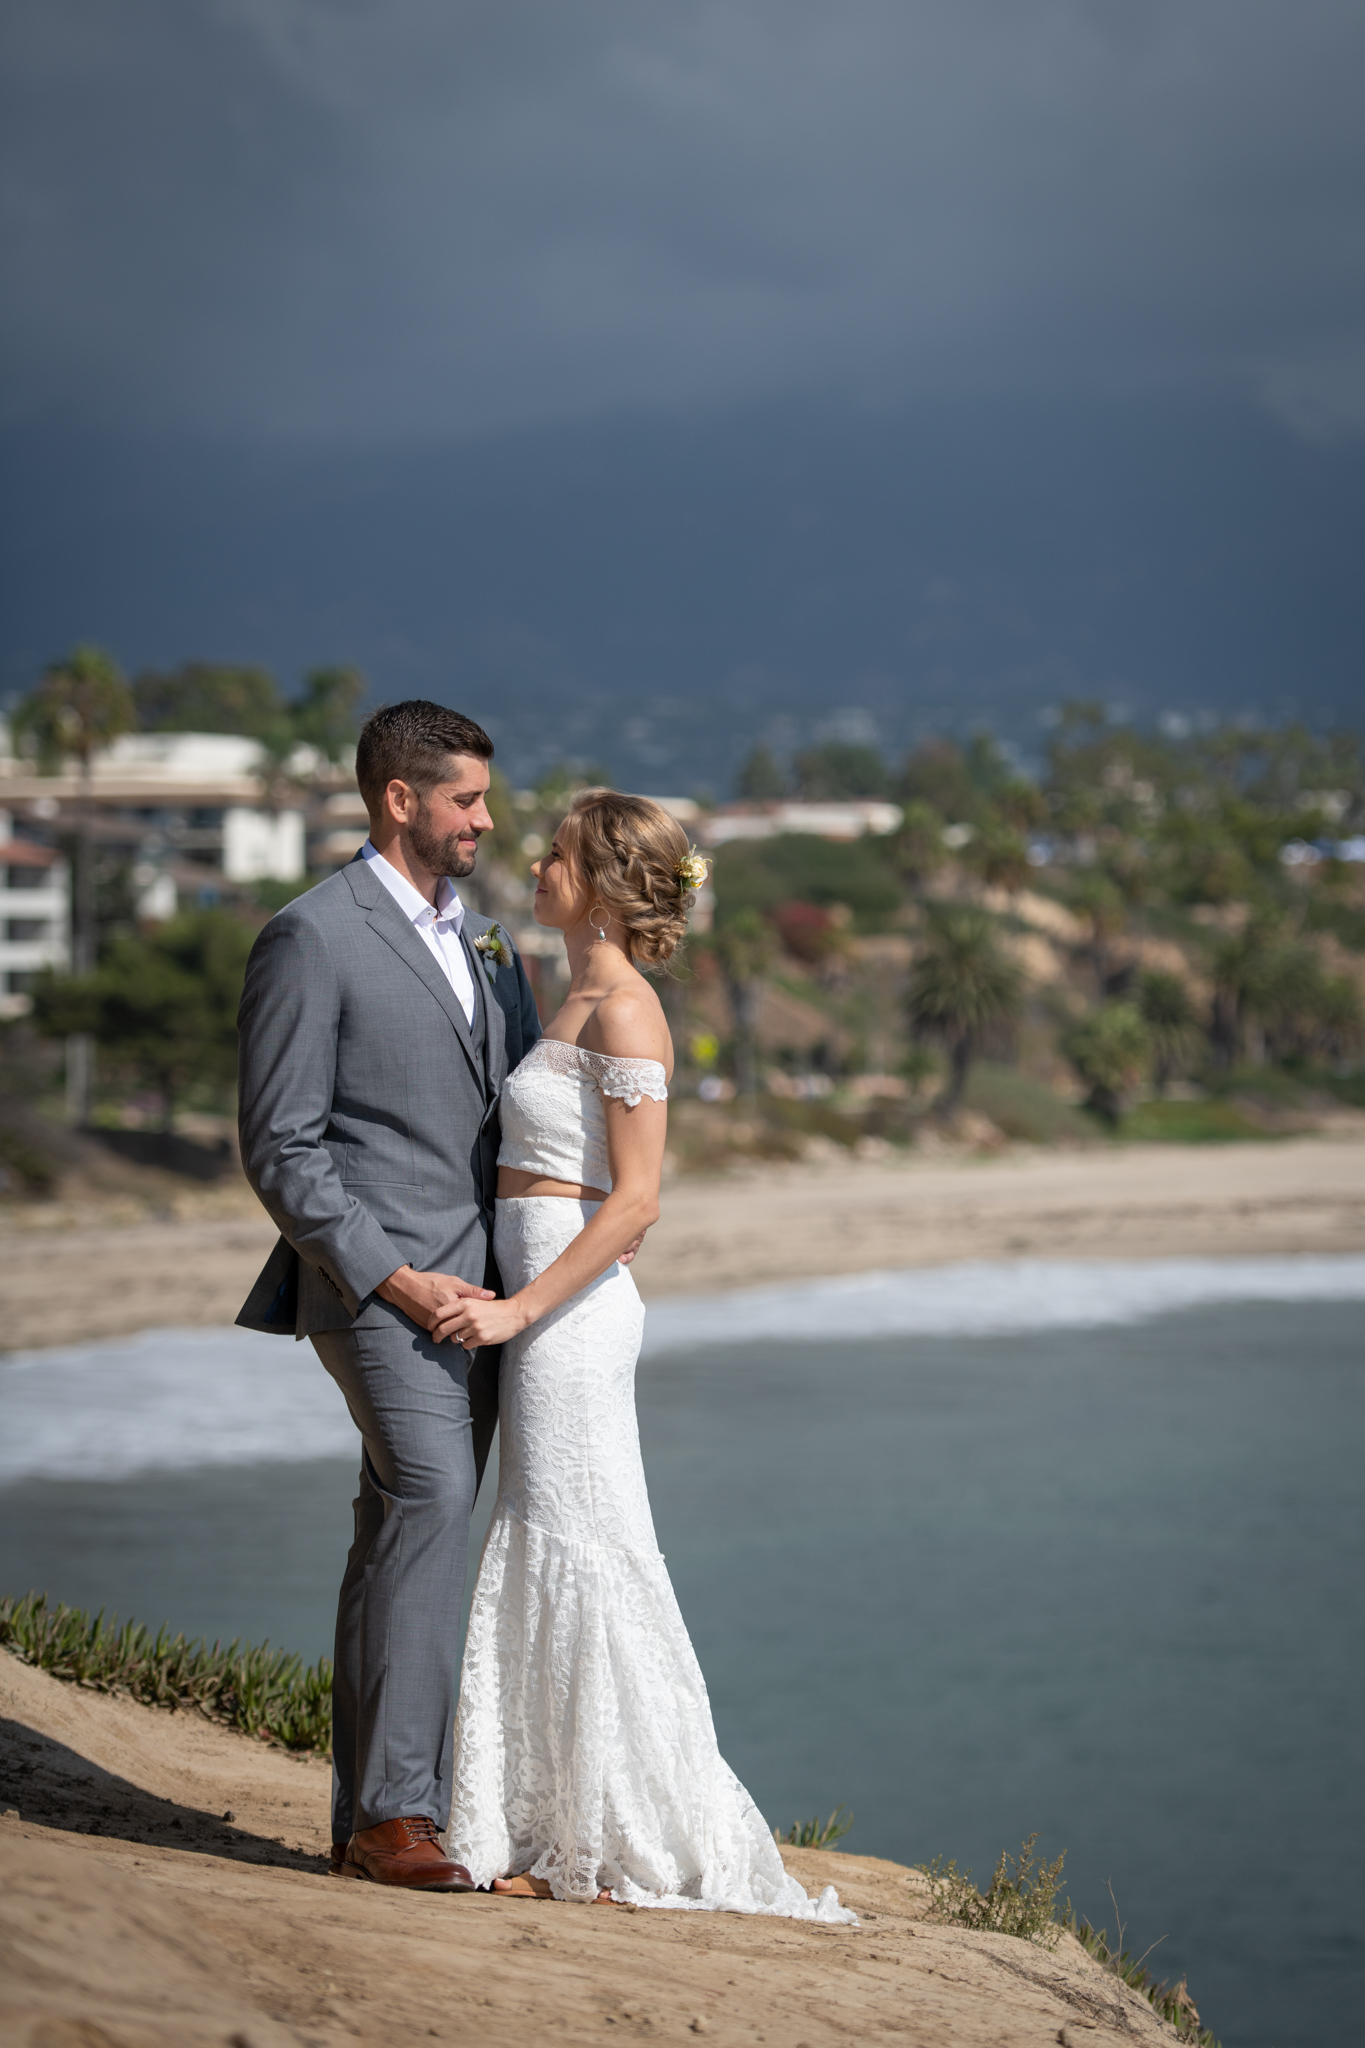 16_PRVW_Jenny_Ken_Wedding_Trevor_Hooper_Photo.jpg